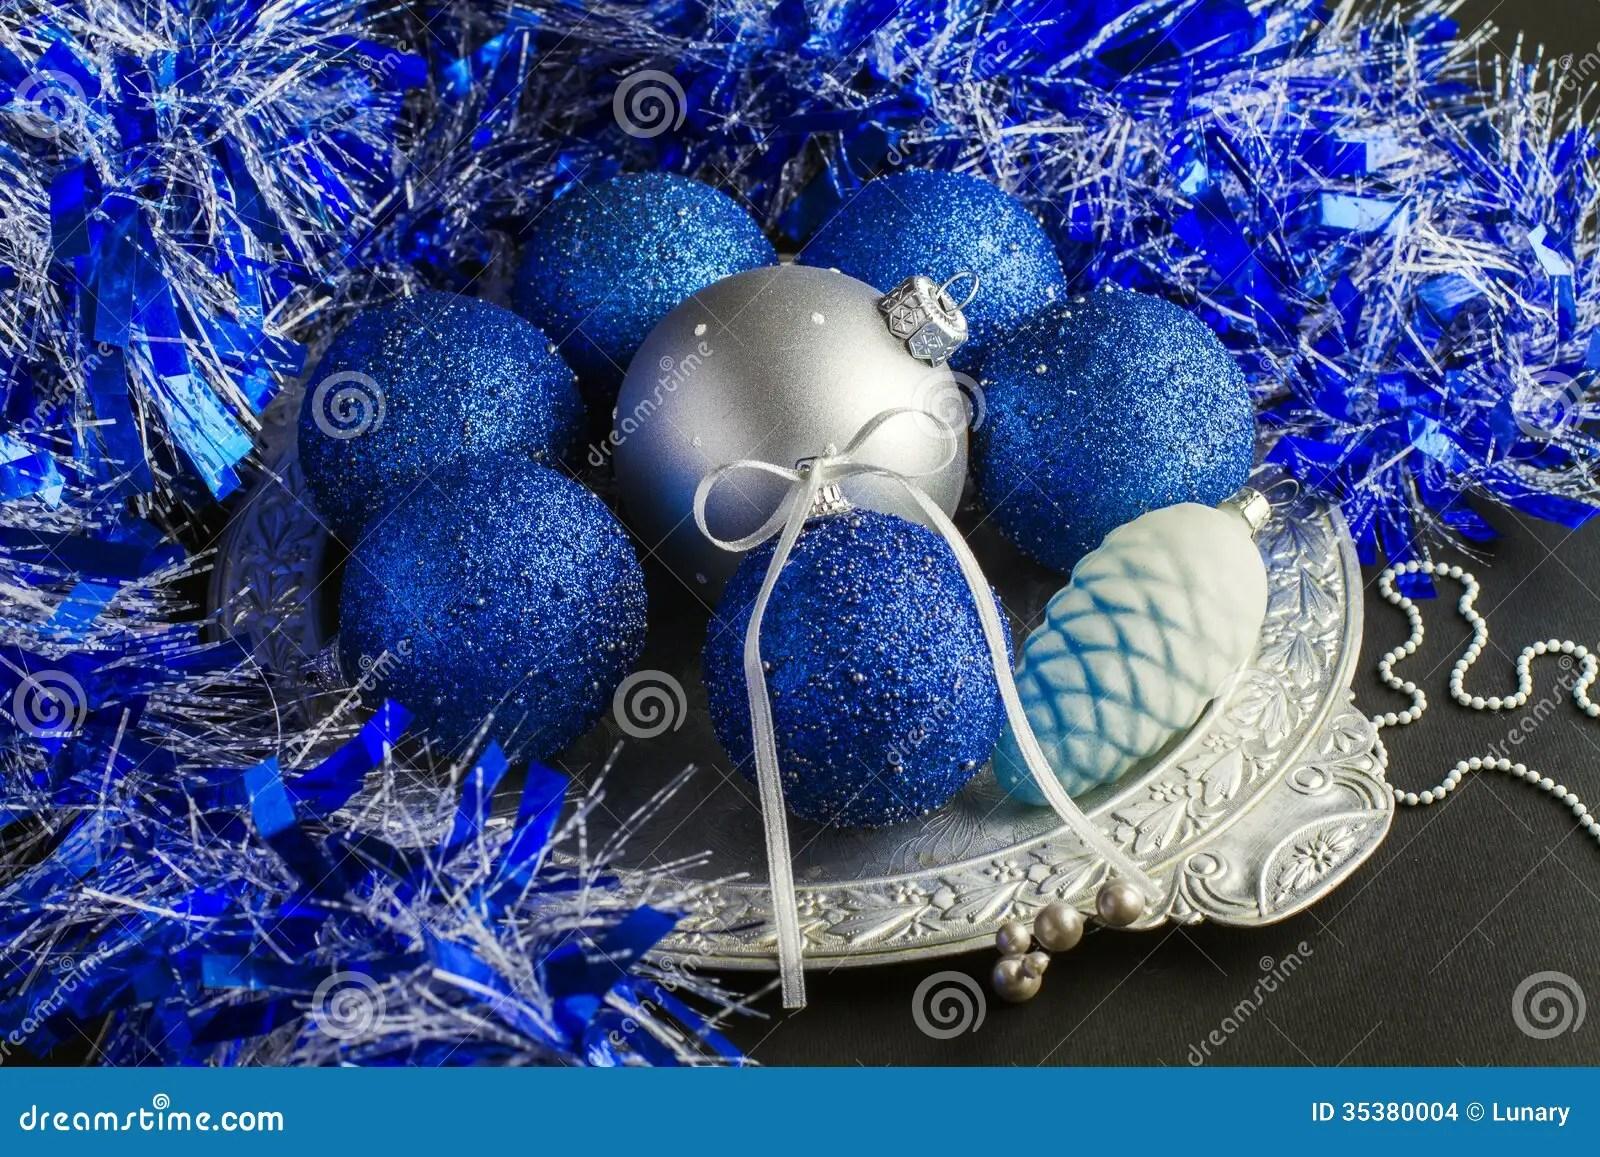 As Royal Decor 3d Wallpaper Blue Christmas Decorations Stock Images Image 35380004